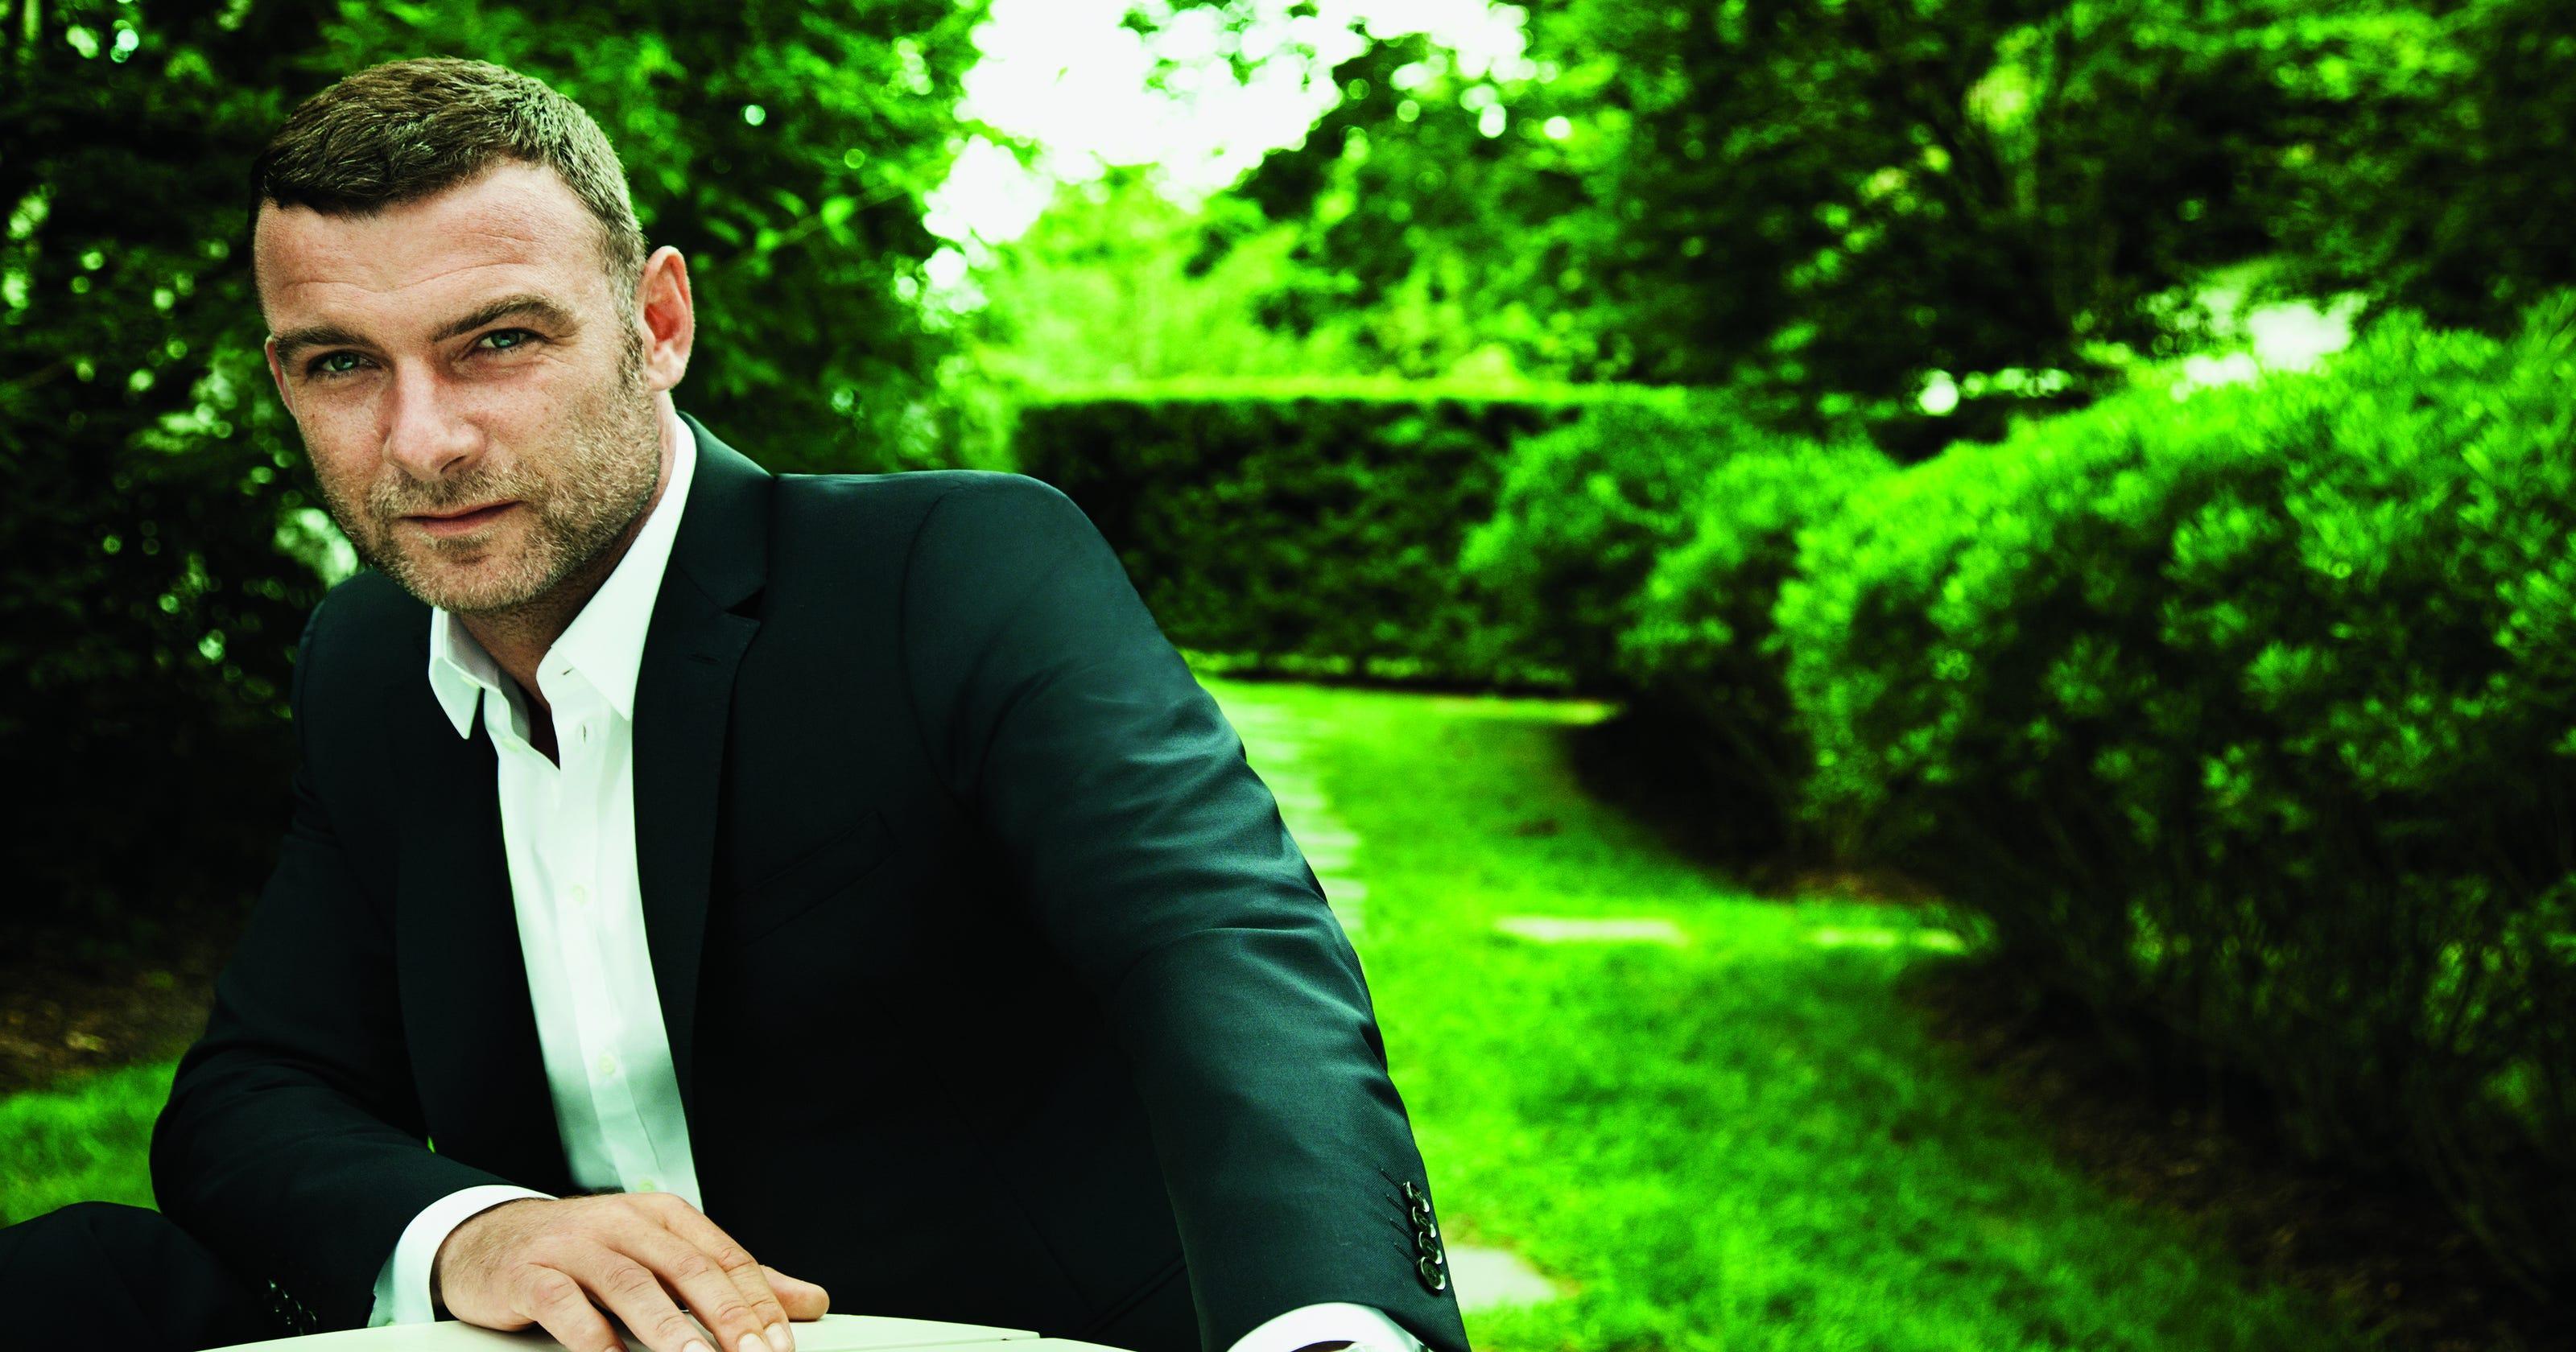 Liev Schreiber likes cigars, Naomi Watts, 'Ray Donovan'